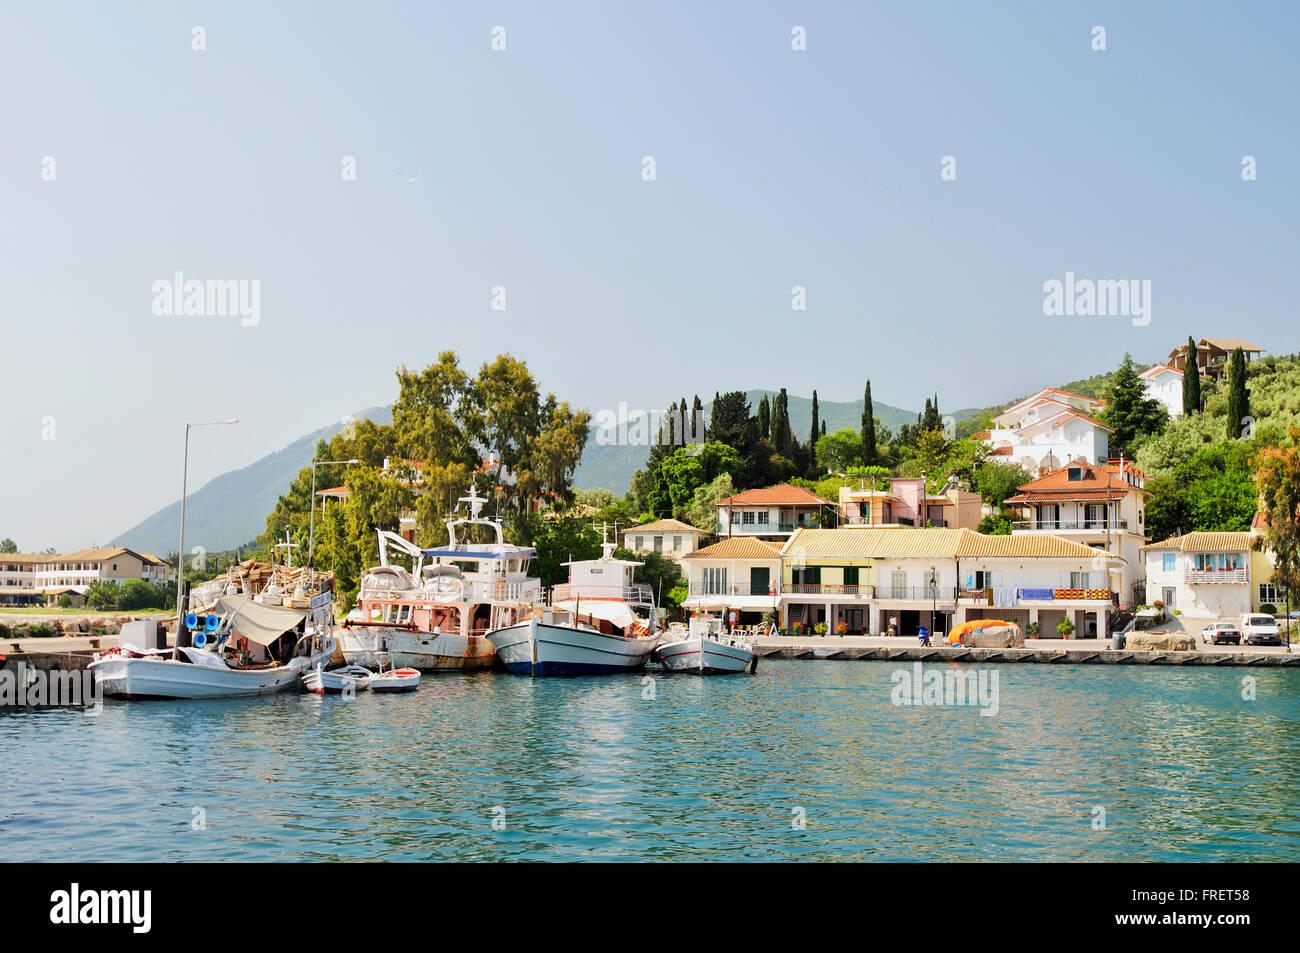 Greece, Ionian Islands, Lefkada, Lygia, harbour - Stock Image